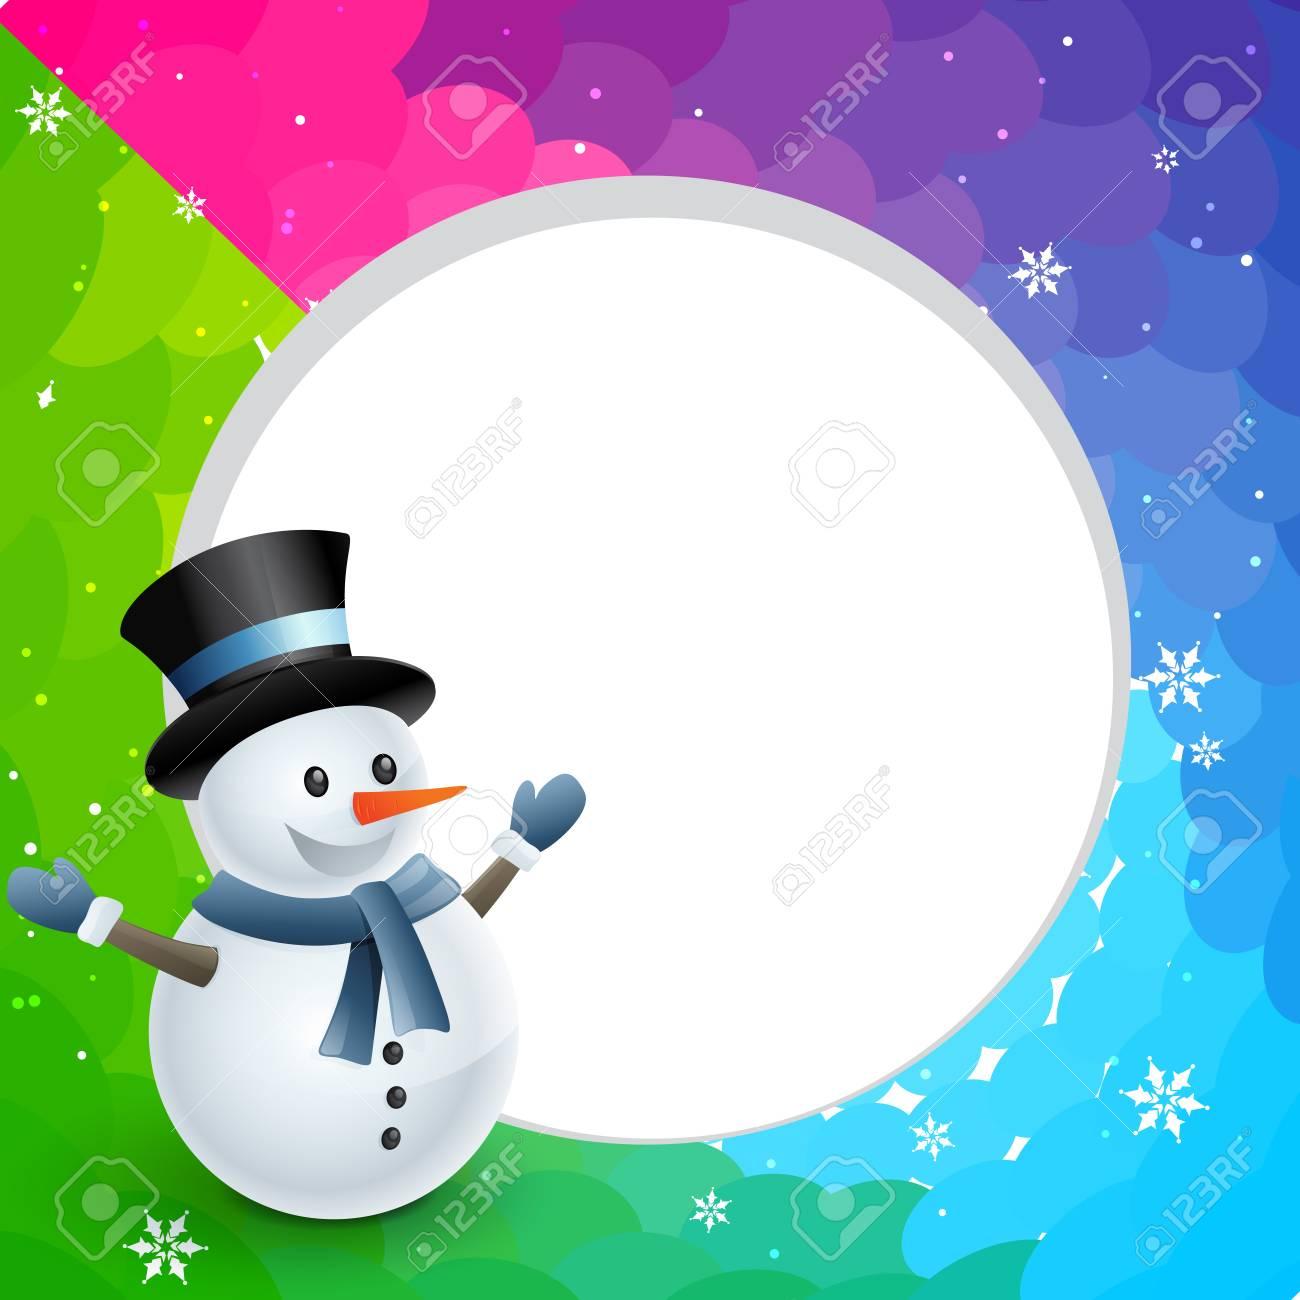 happy christmas winter snowman design illustration Stock Vector - 24307052